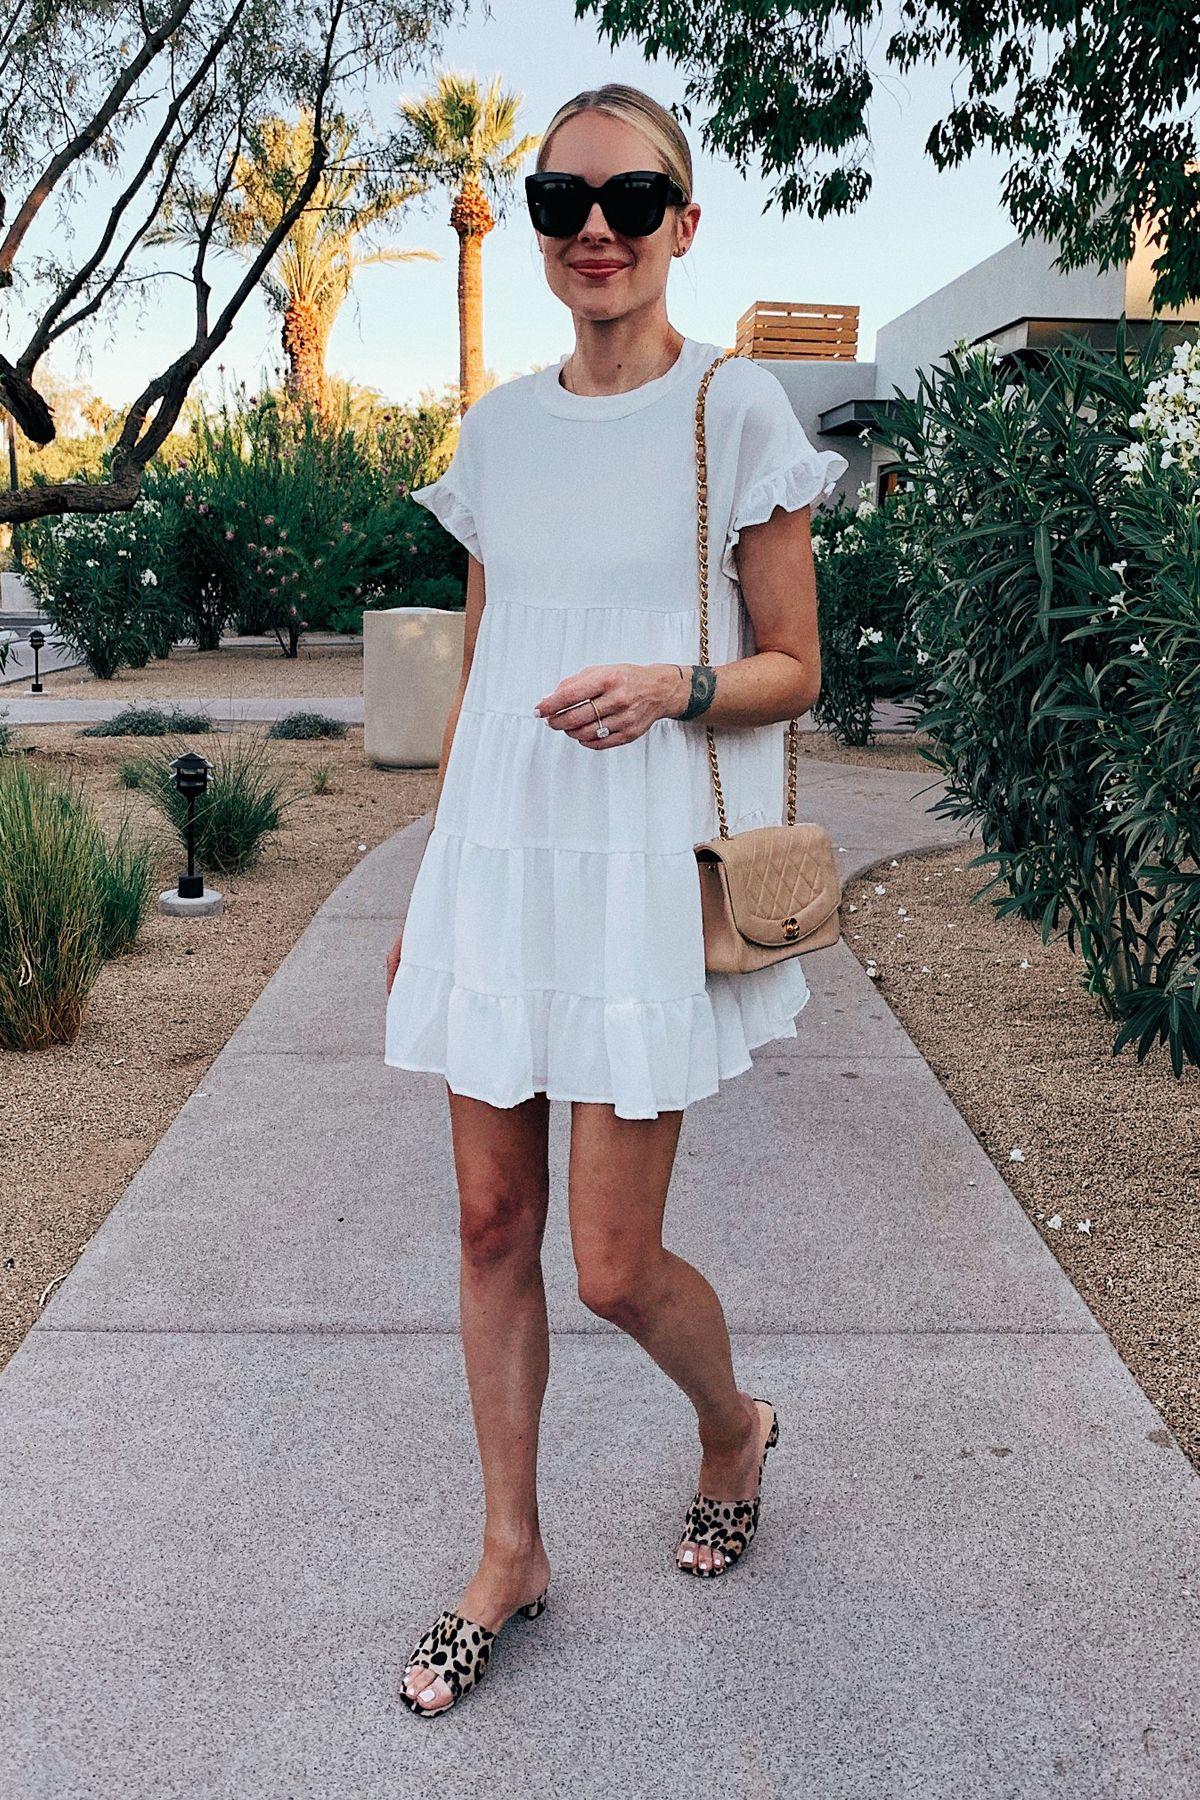 Fashion Jackson Wearing Amazon Fashion White Summer Dress Leopard Sandals White Dress Summer Fashion Jackson Fashion [ 1800 x 1200 Pixel ]